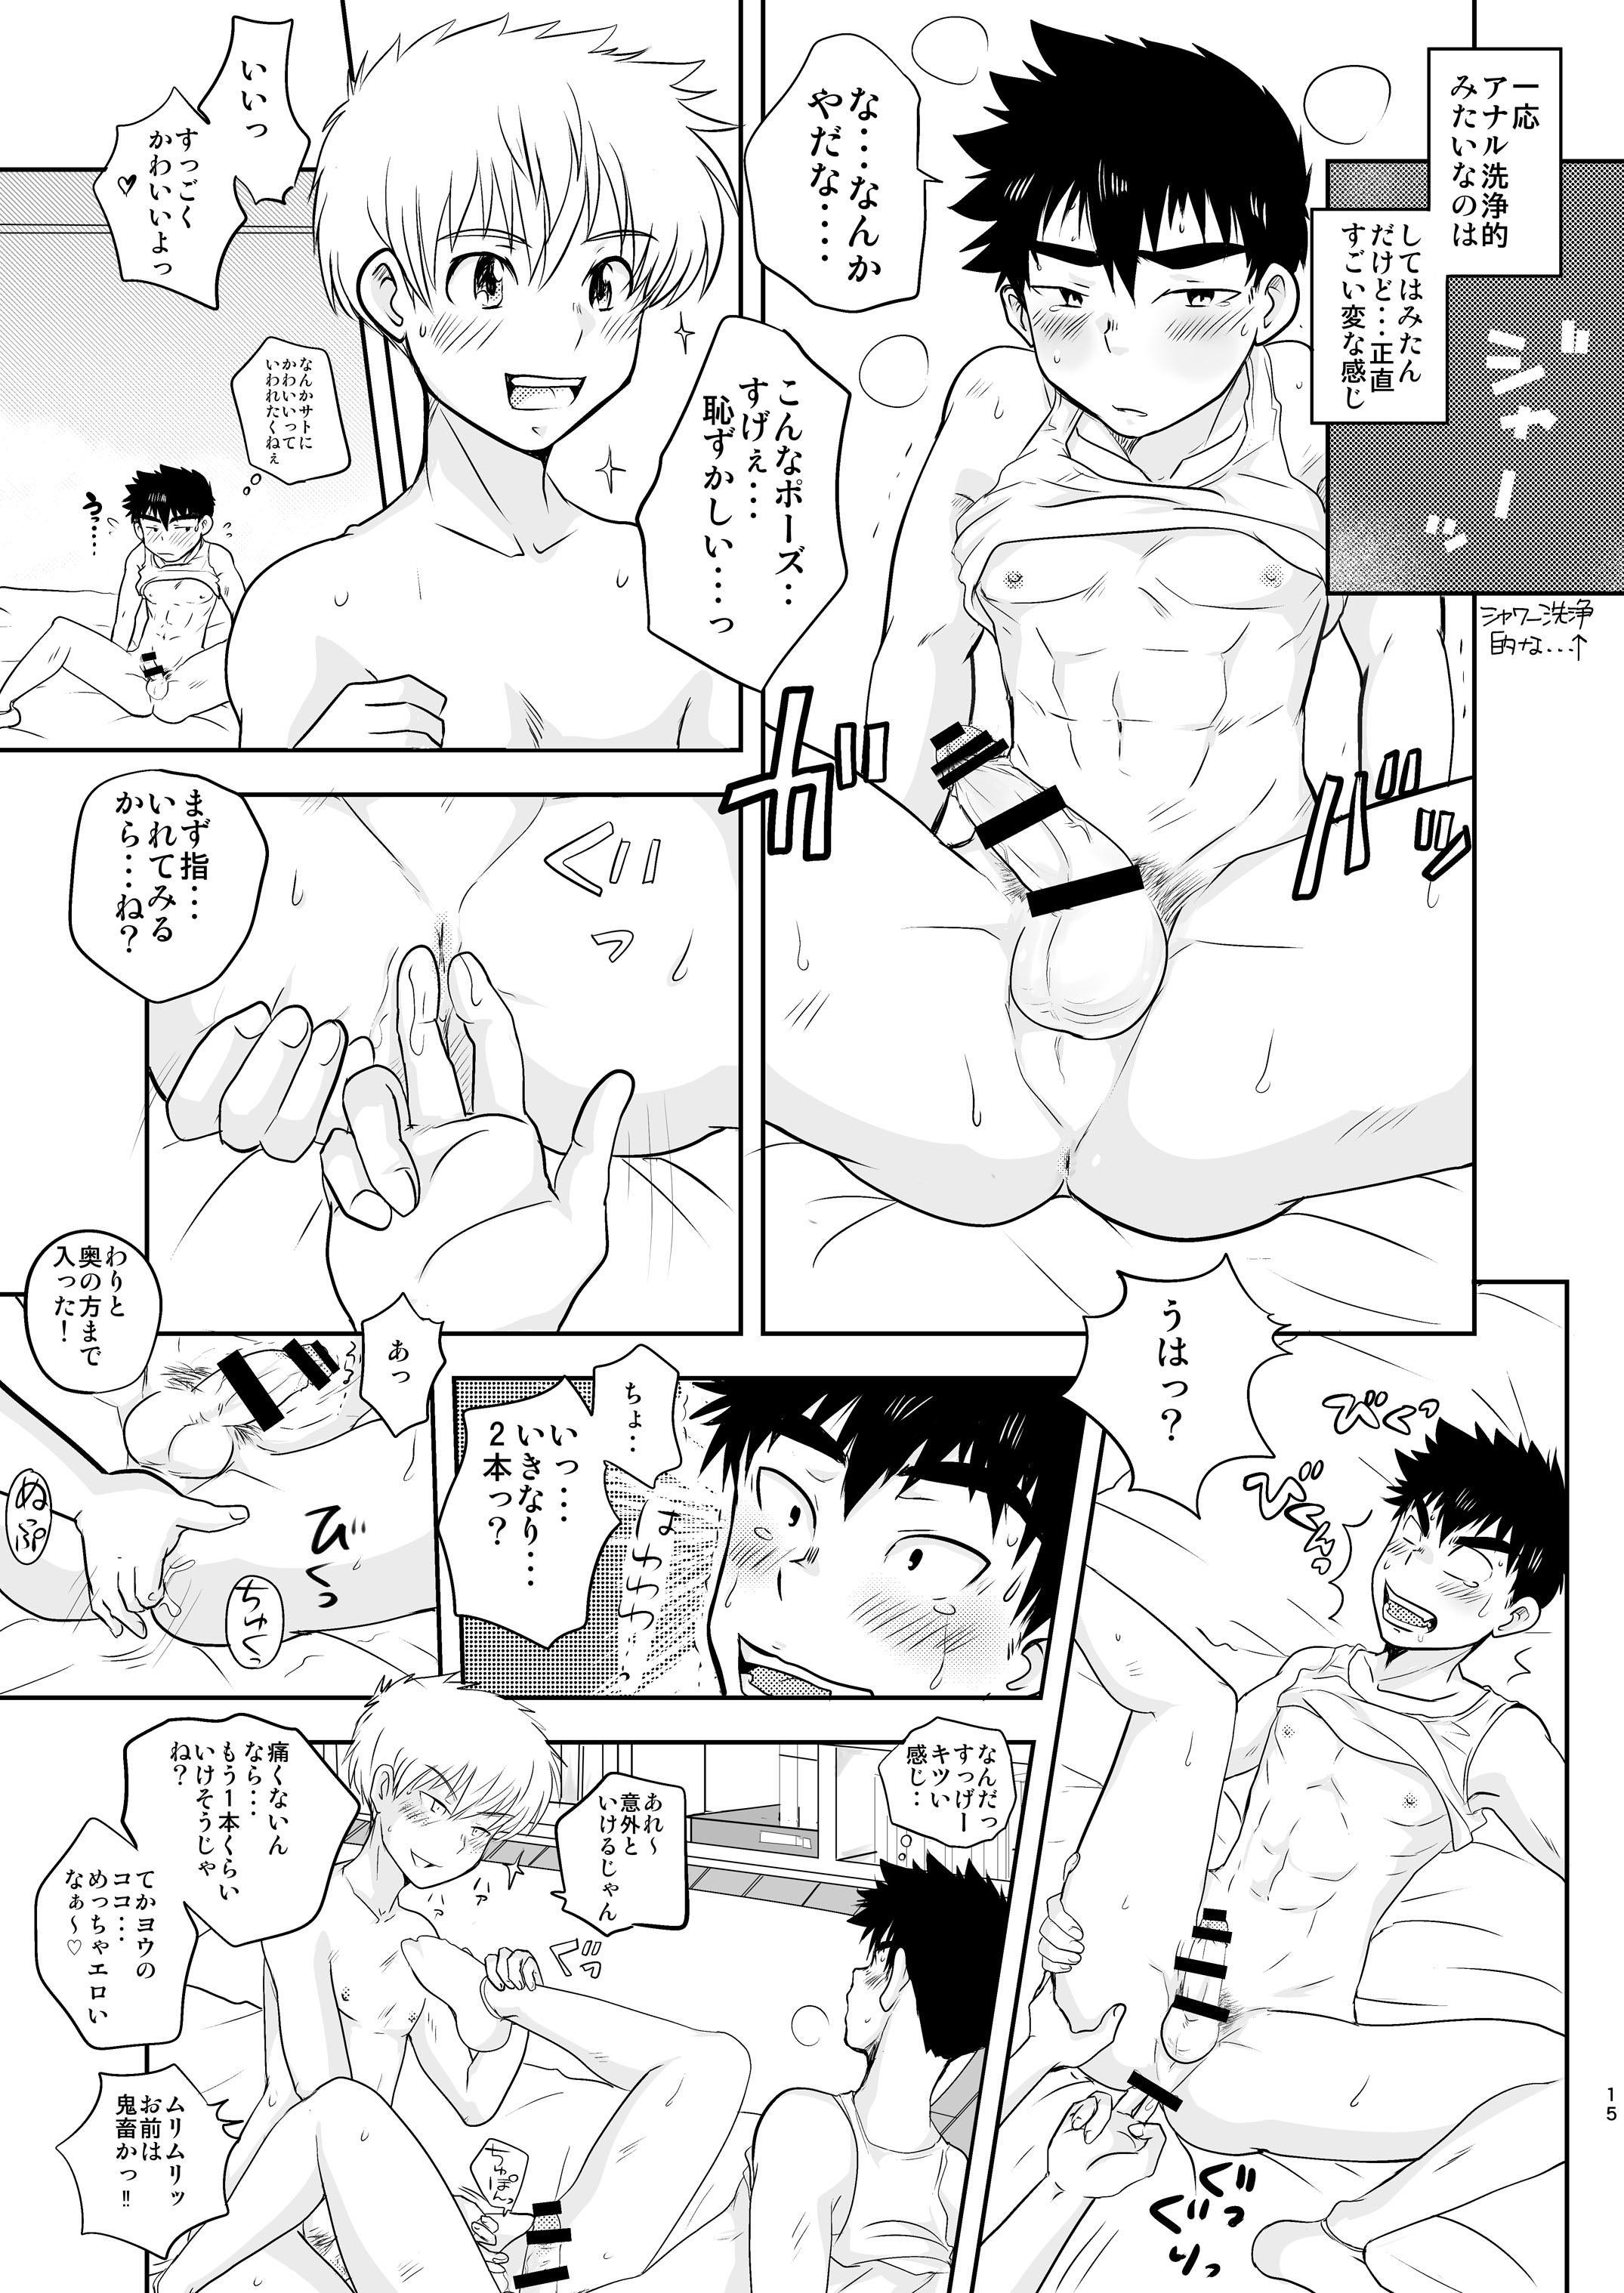 Ikenai! Ikenai! Omae ja Nai to..! 14